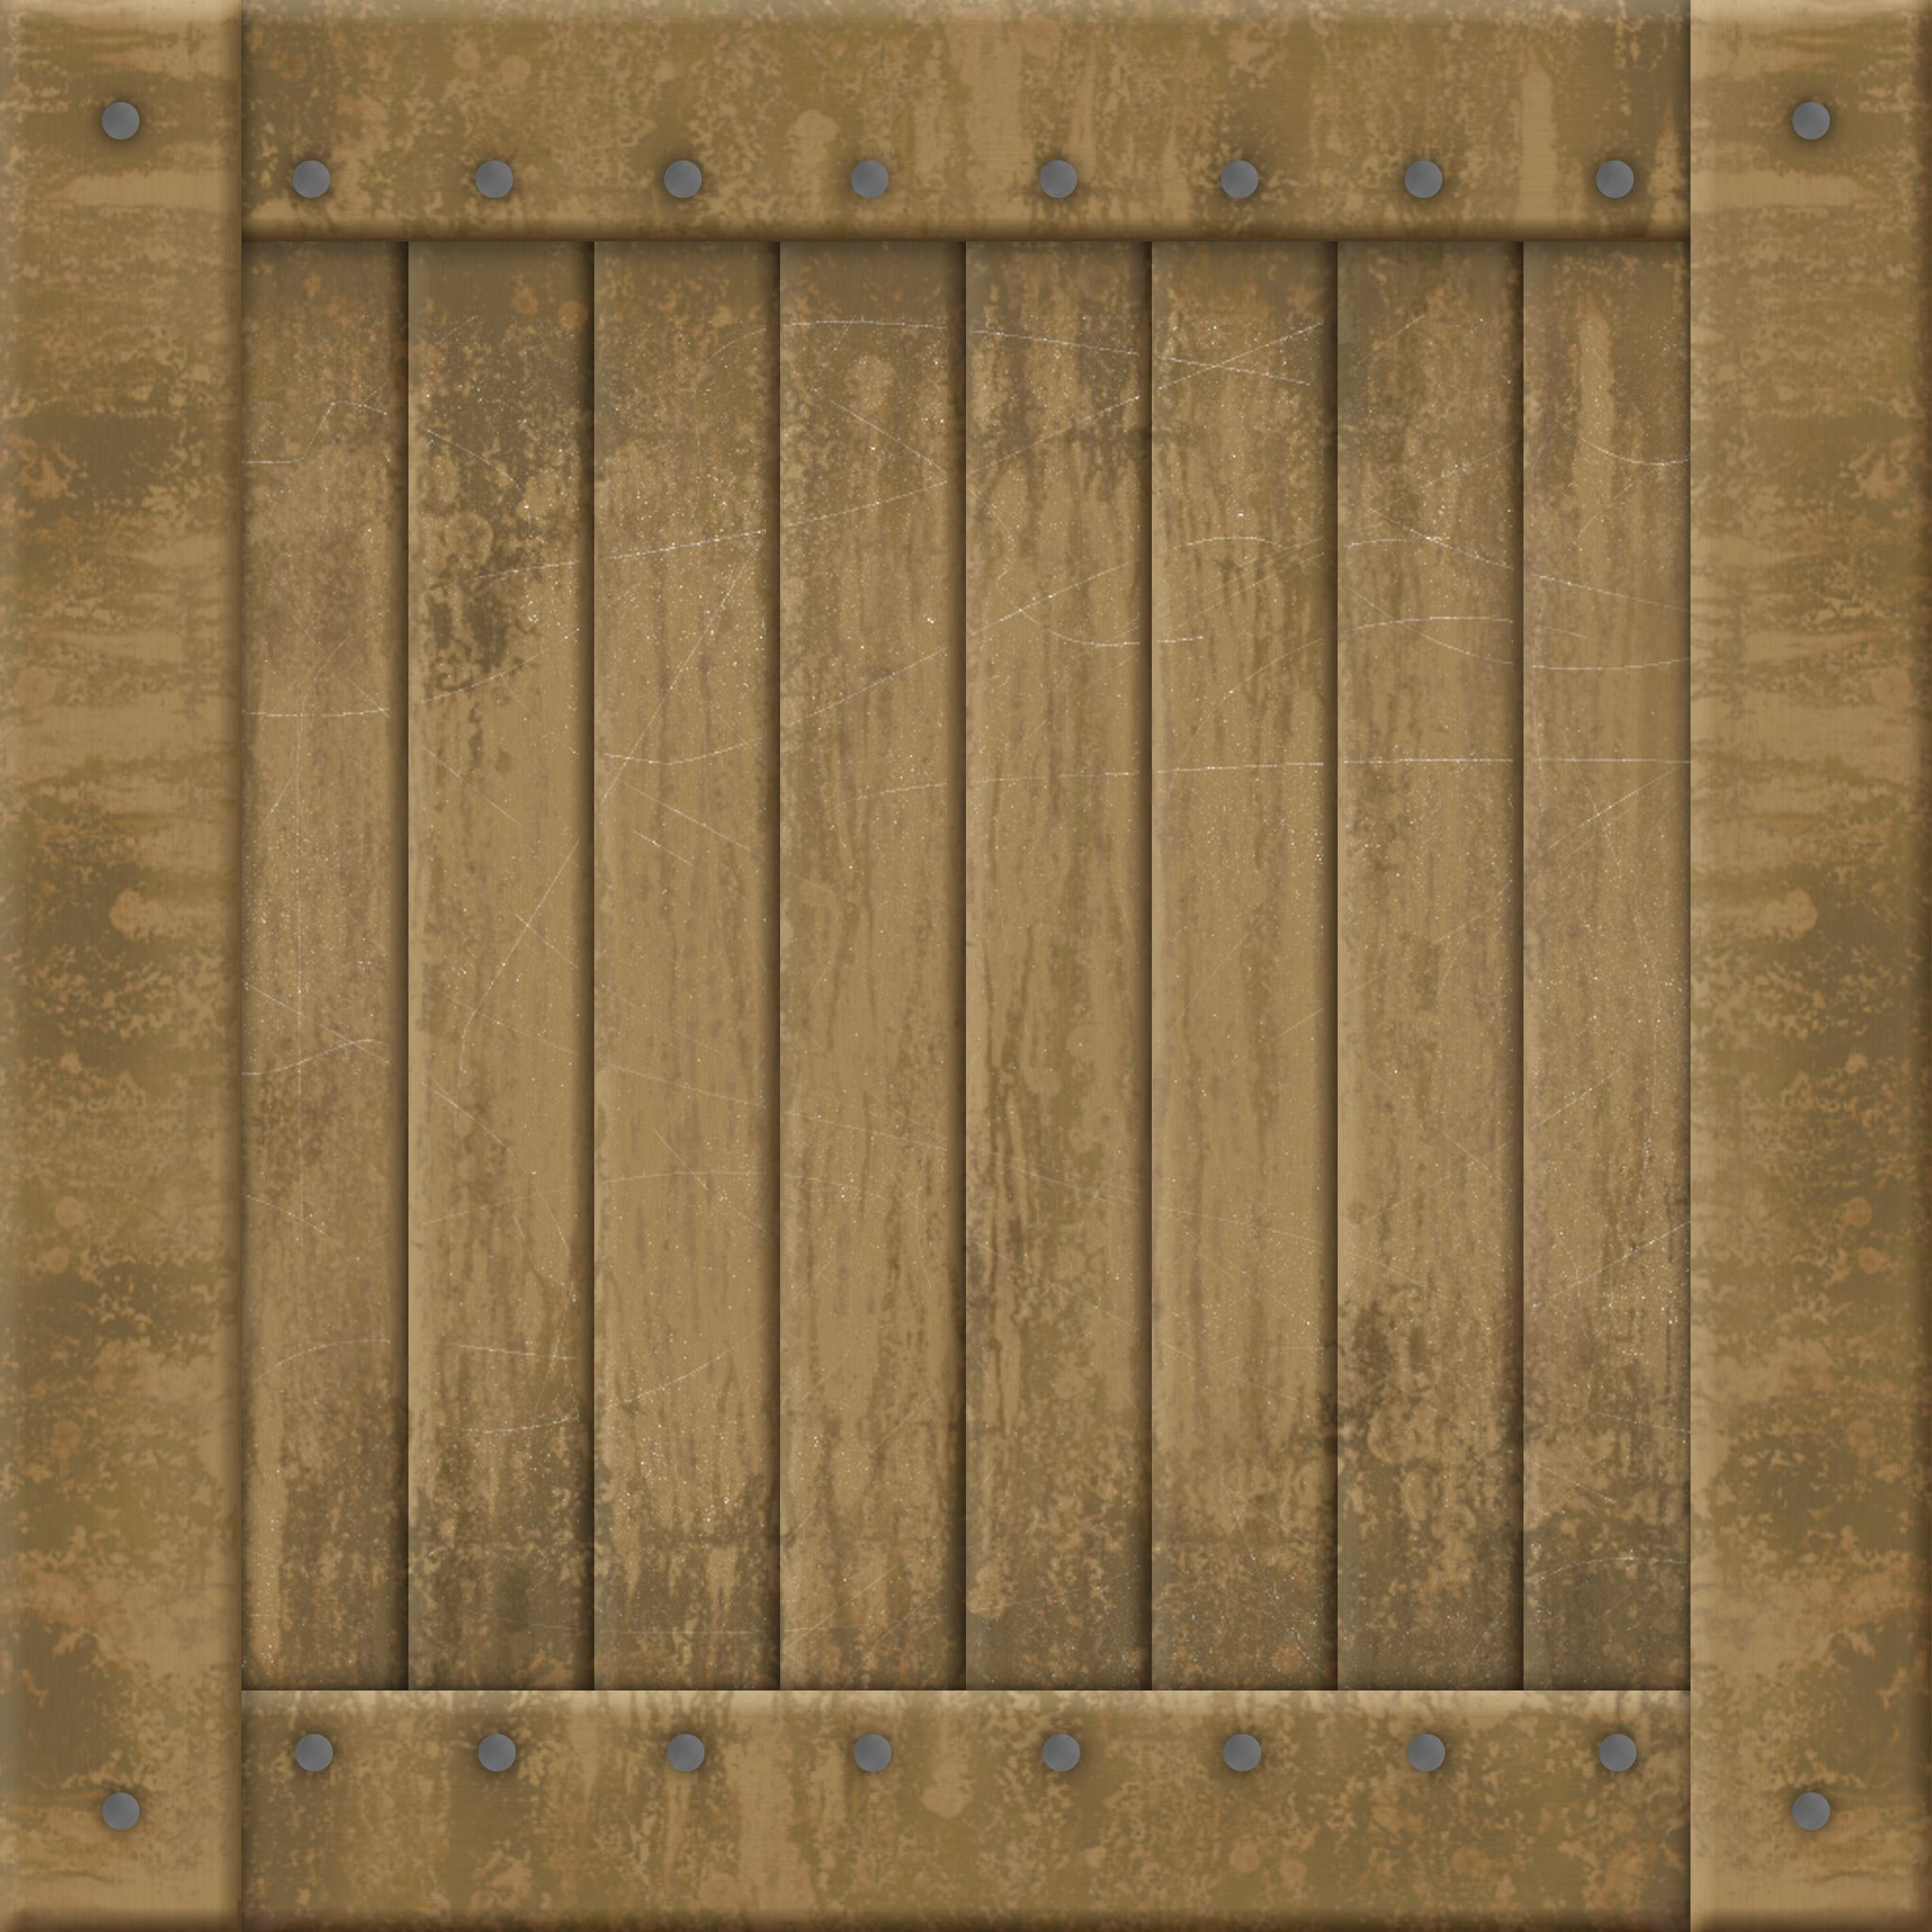 Wooden Crate Texture